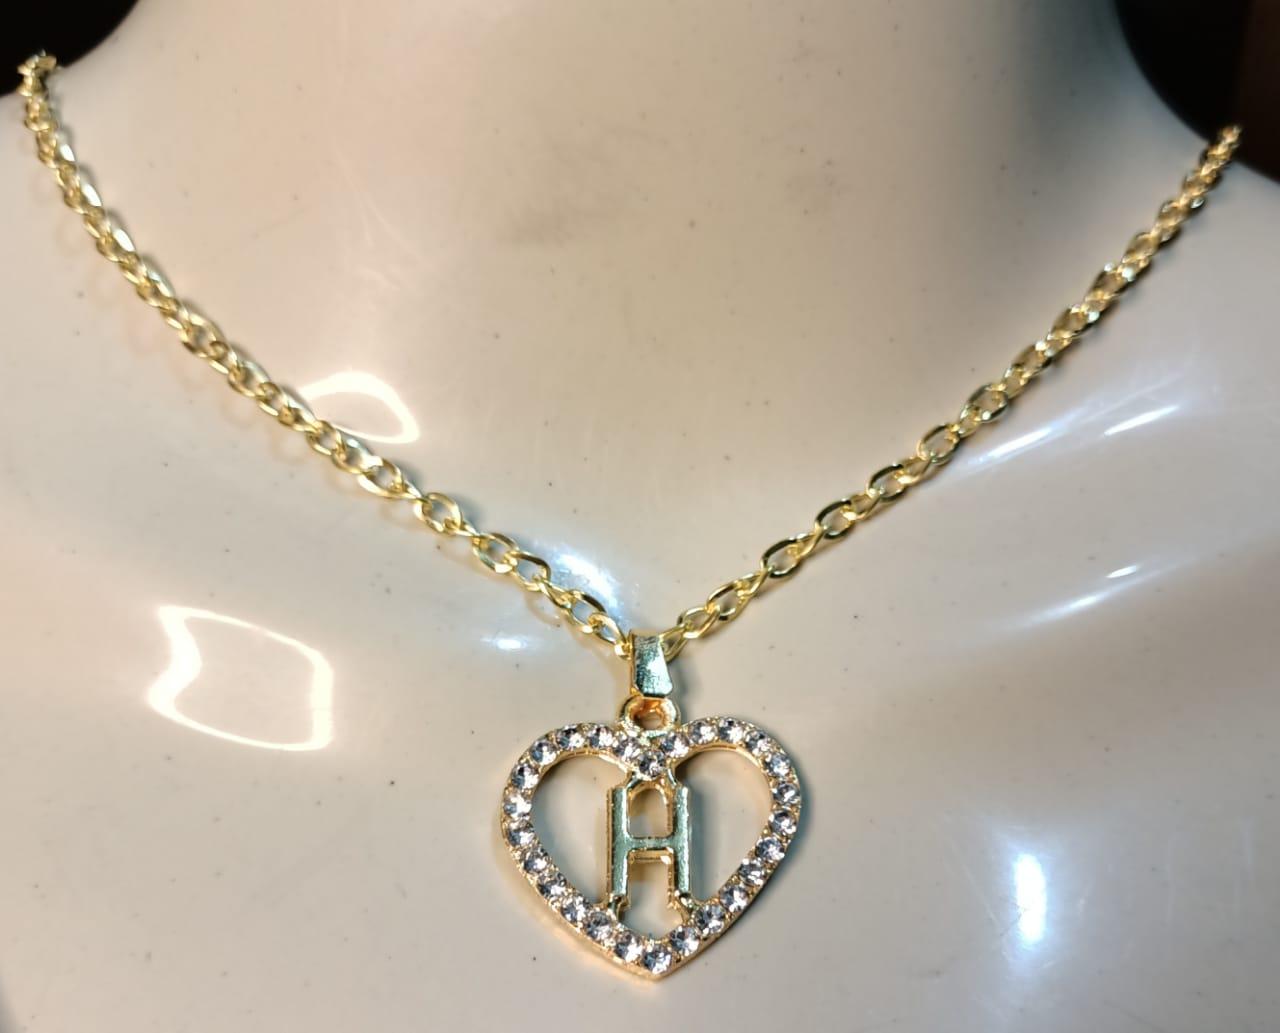 Golden Alloy Chain with Alphabet Heart Necklace/Locket/Pendants for Girls/Women/boys/men  - A to Z